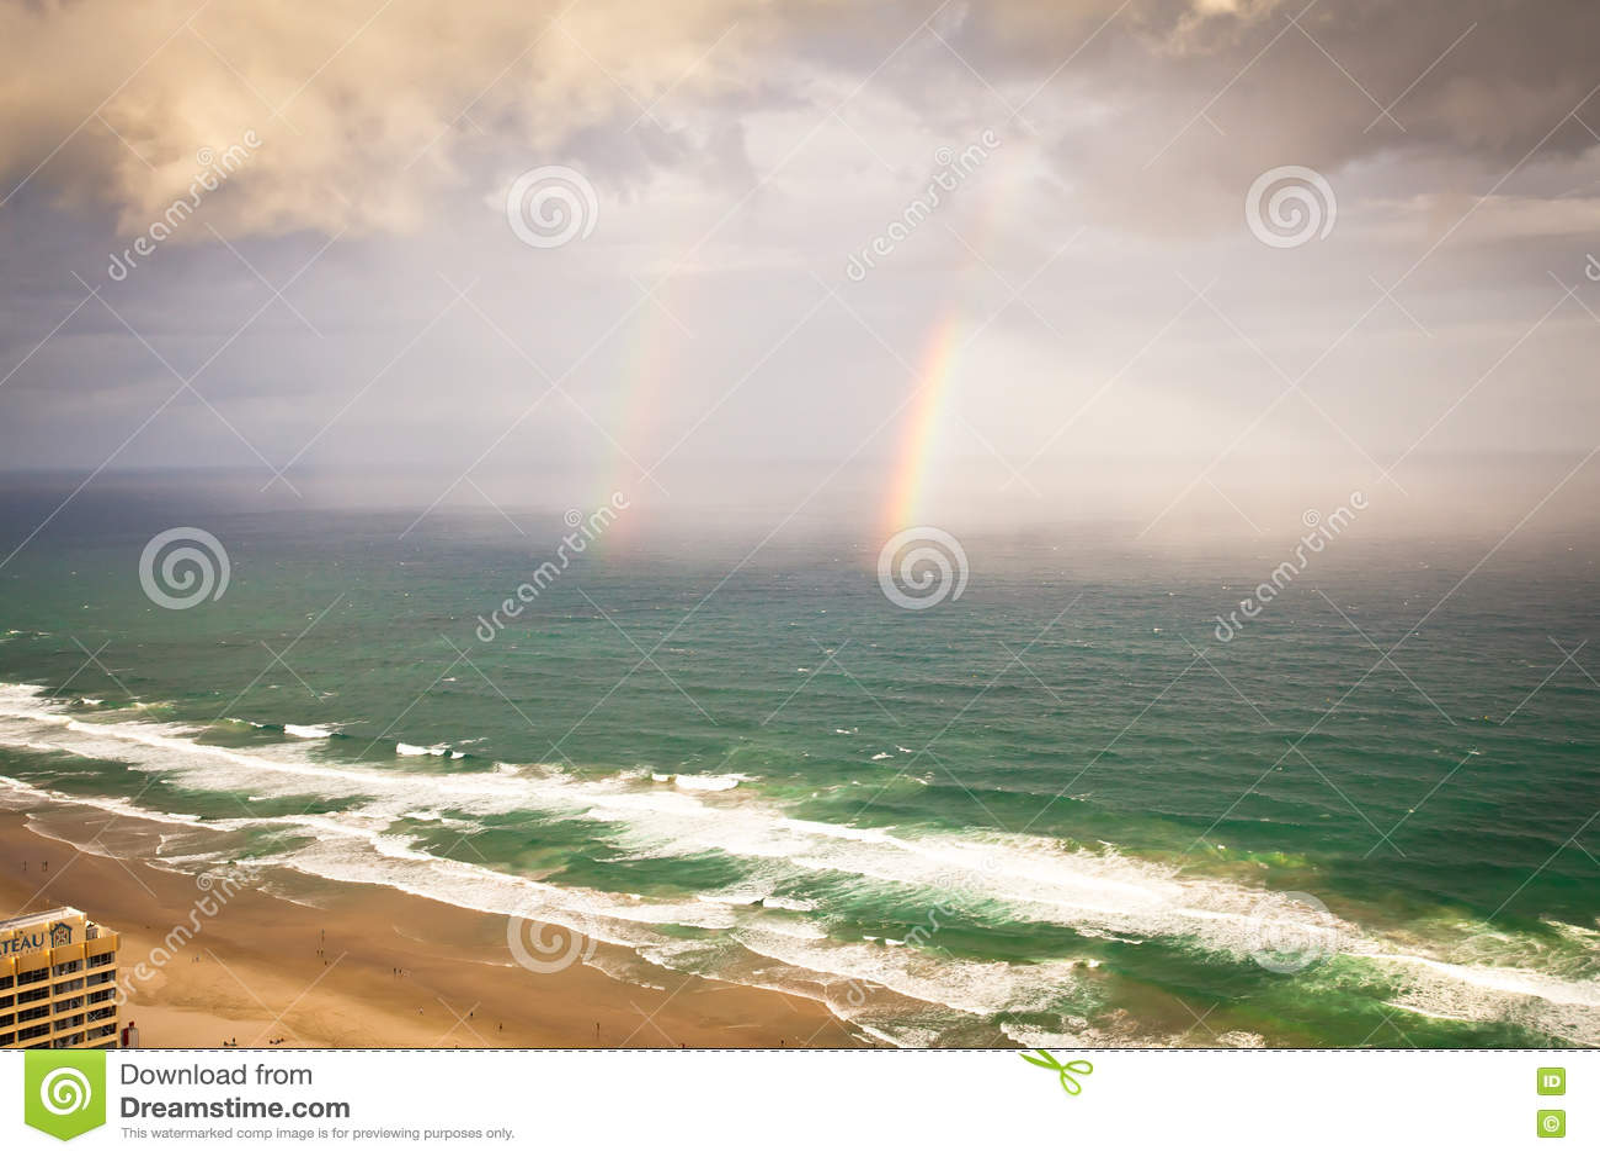 Gold Coast Queensland Australia - Showers and Rainbow